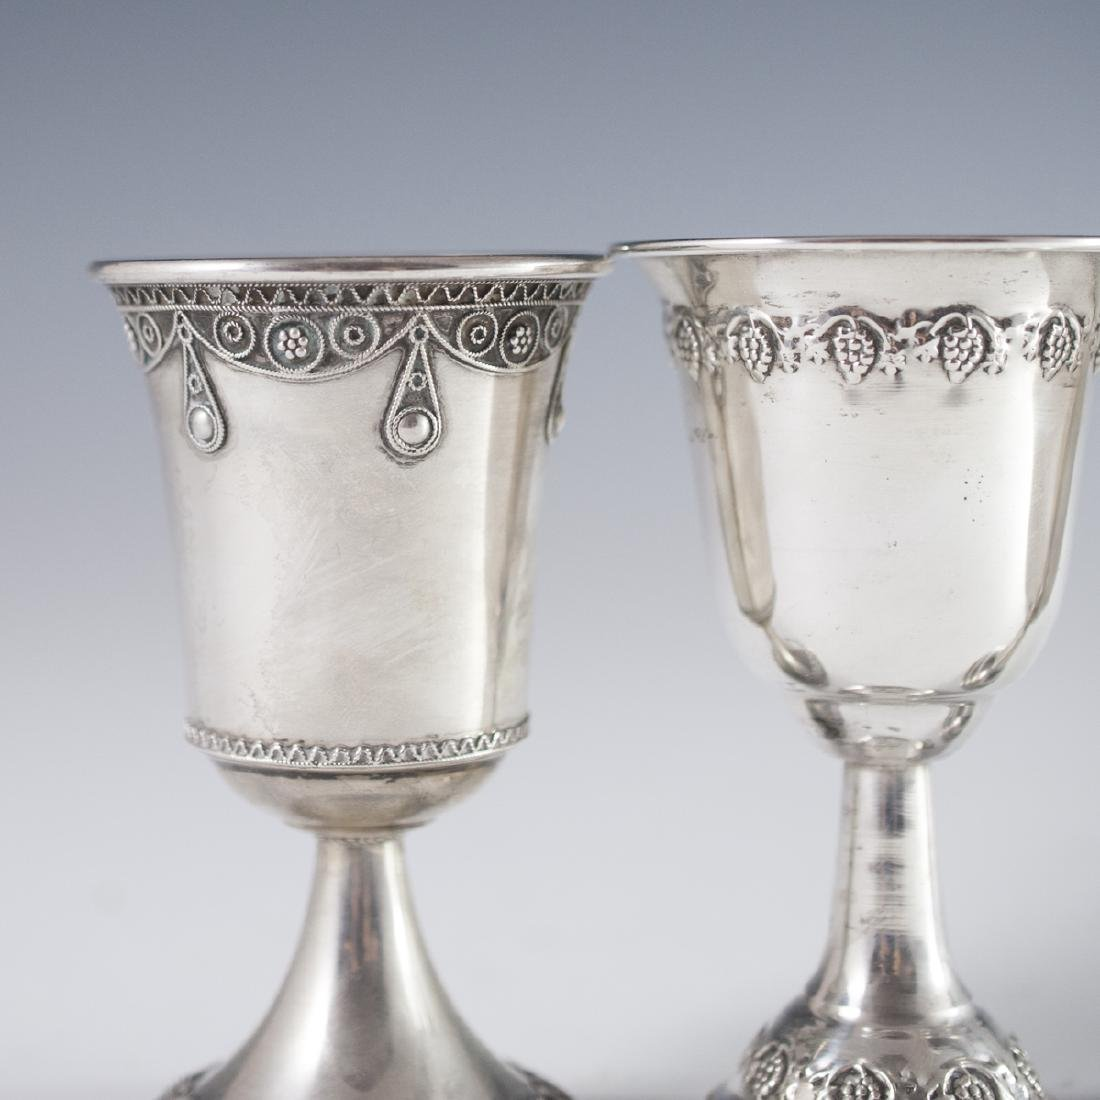 800 Silver Kiddush Cups - 4